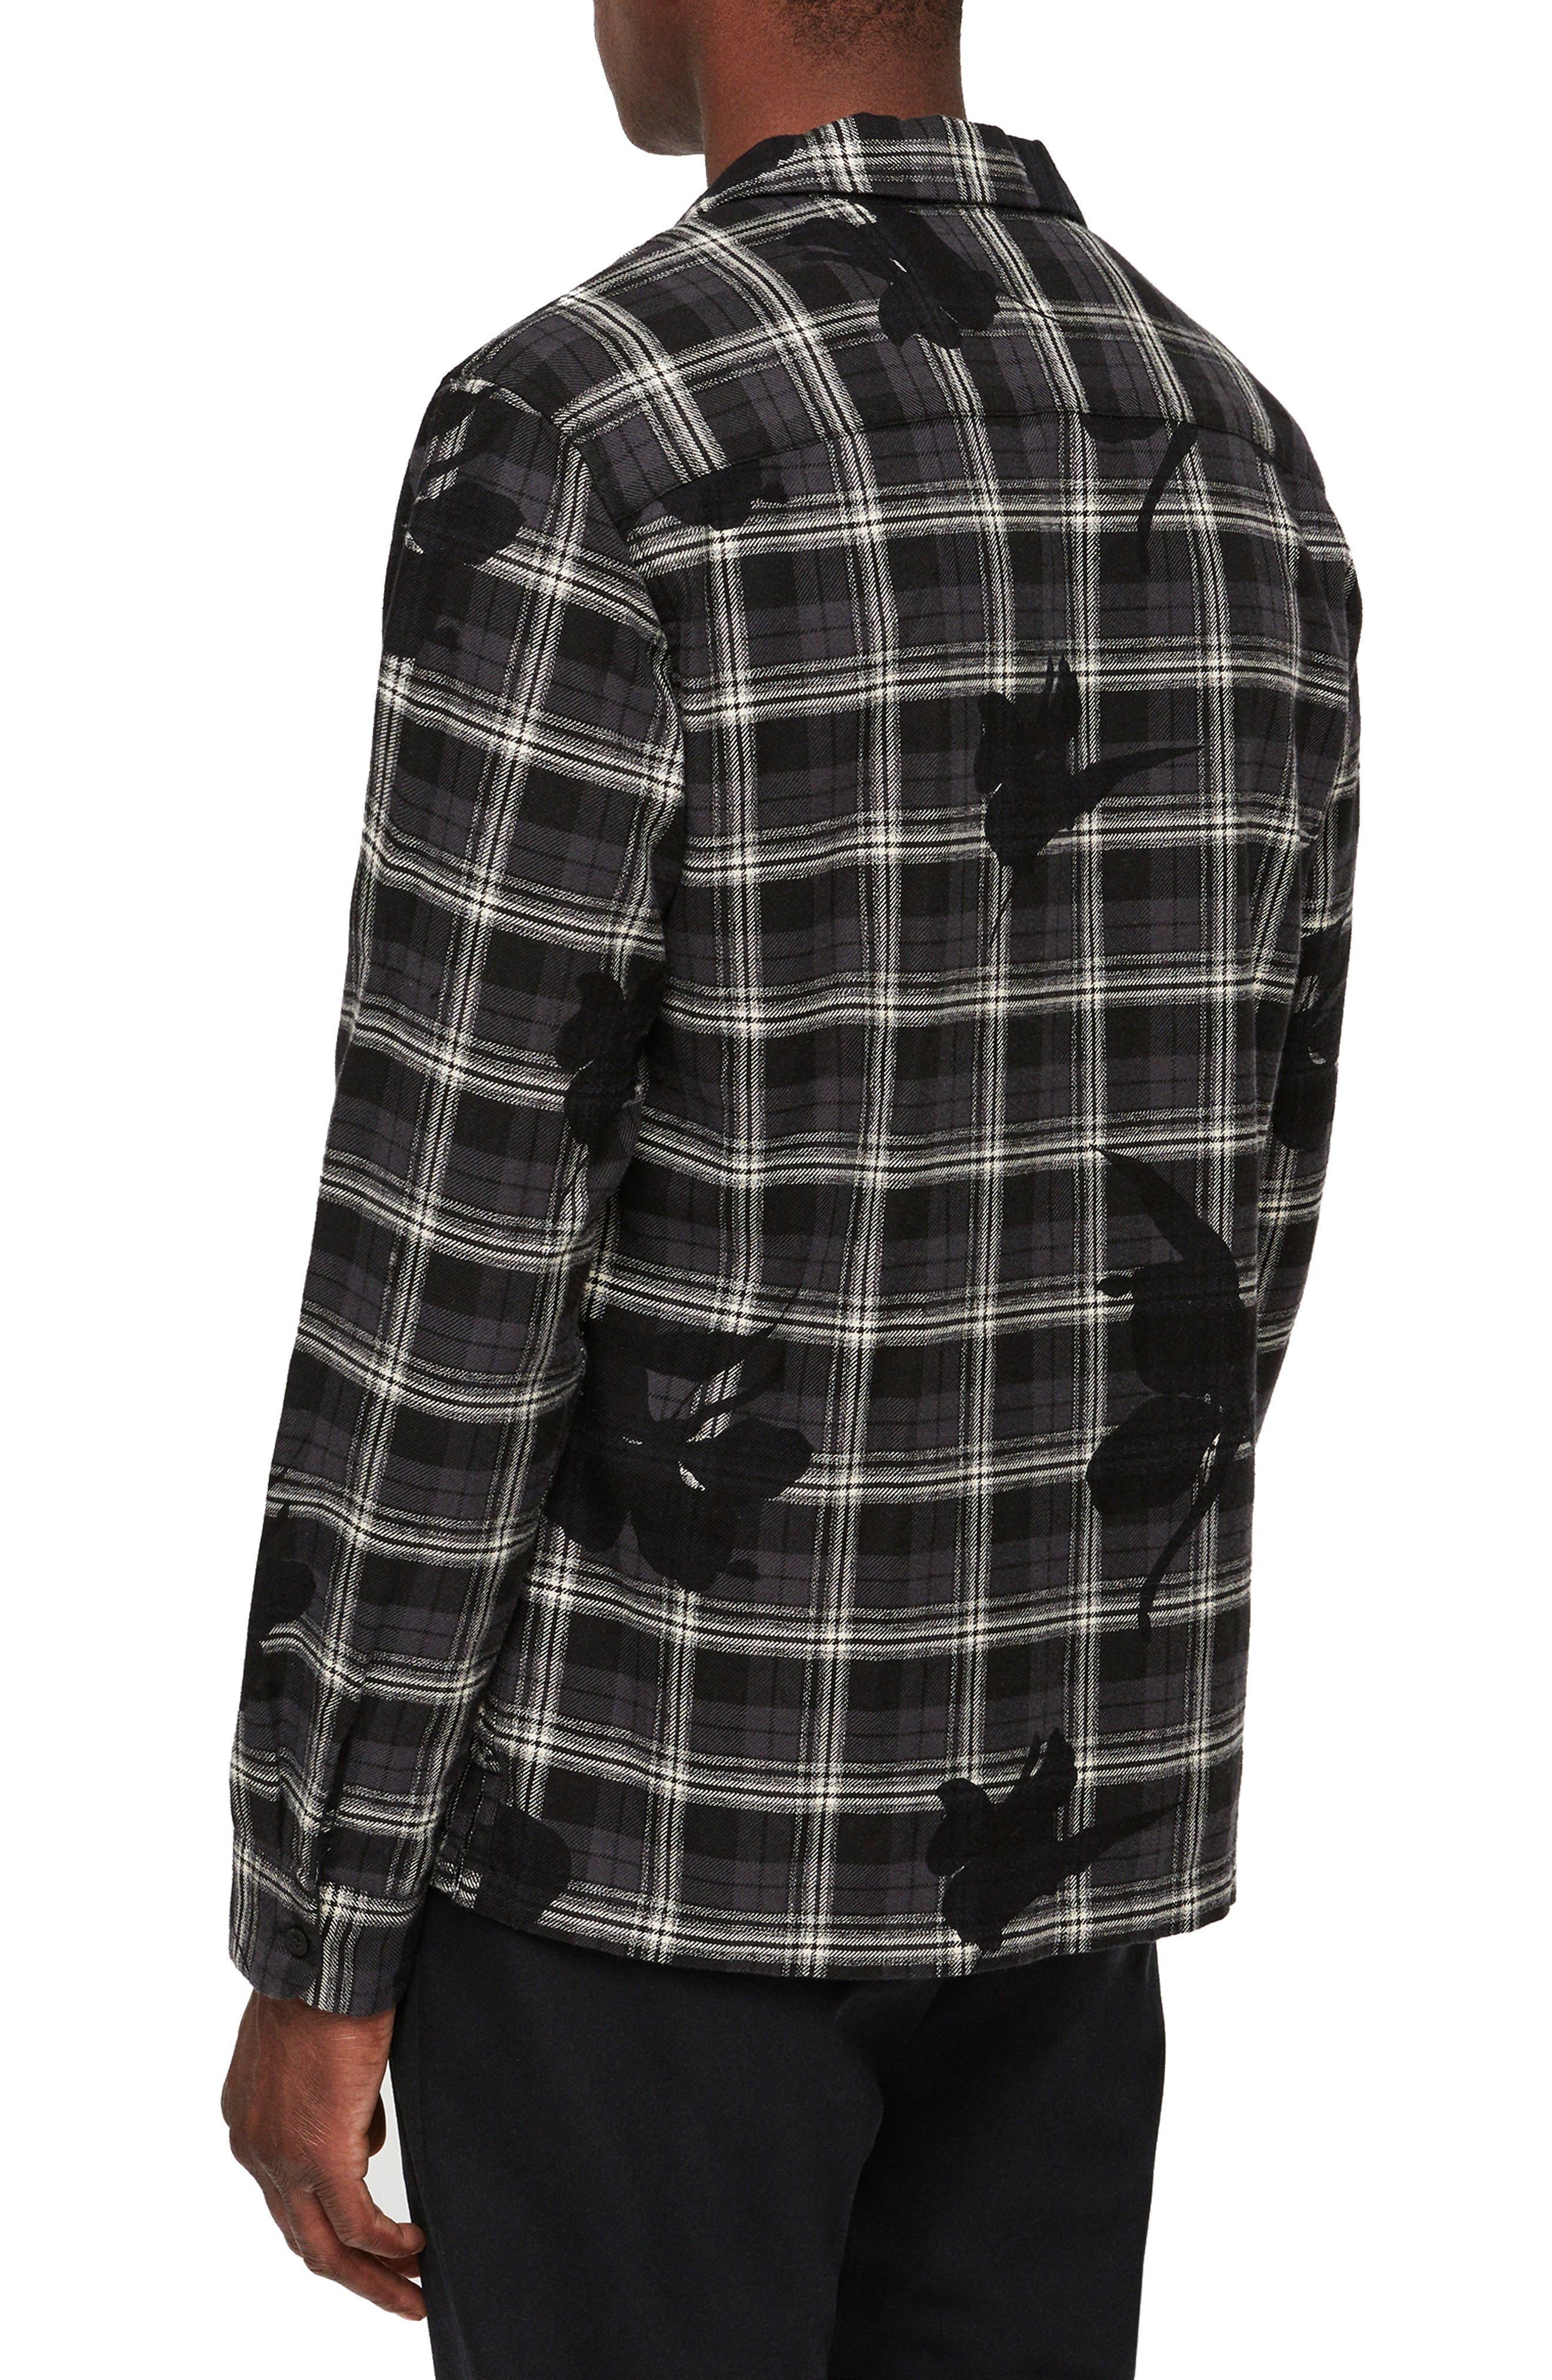 Lilyplaid Slim Fit Flannel Shirt,                             Alternate thumbnail 3, color,                             001